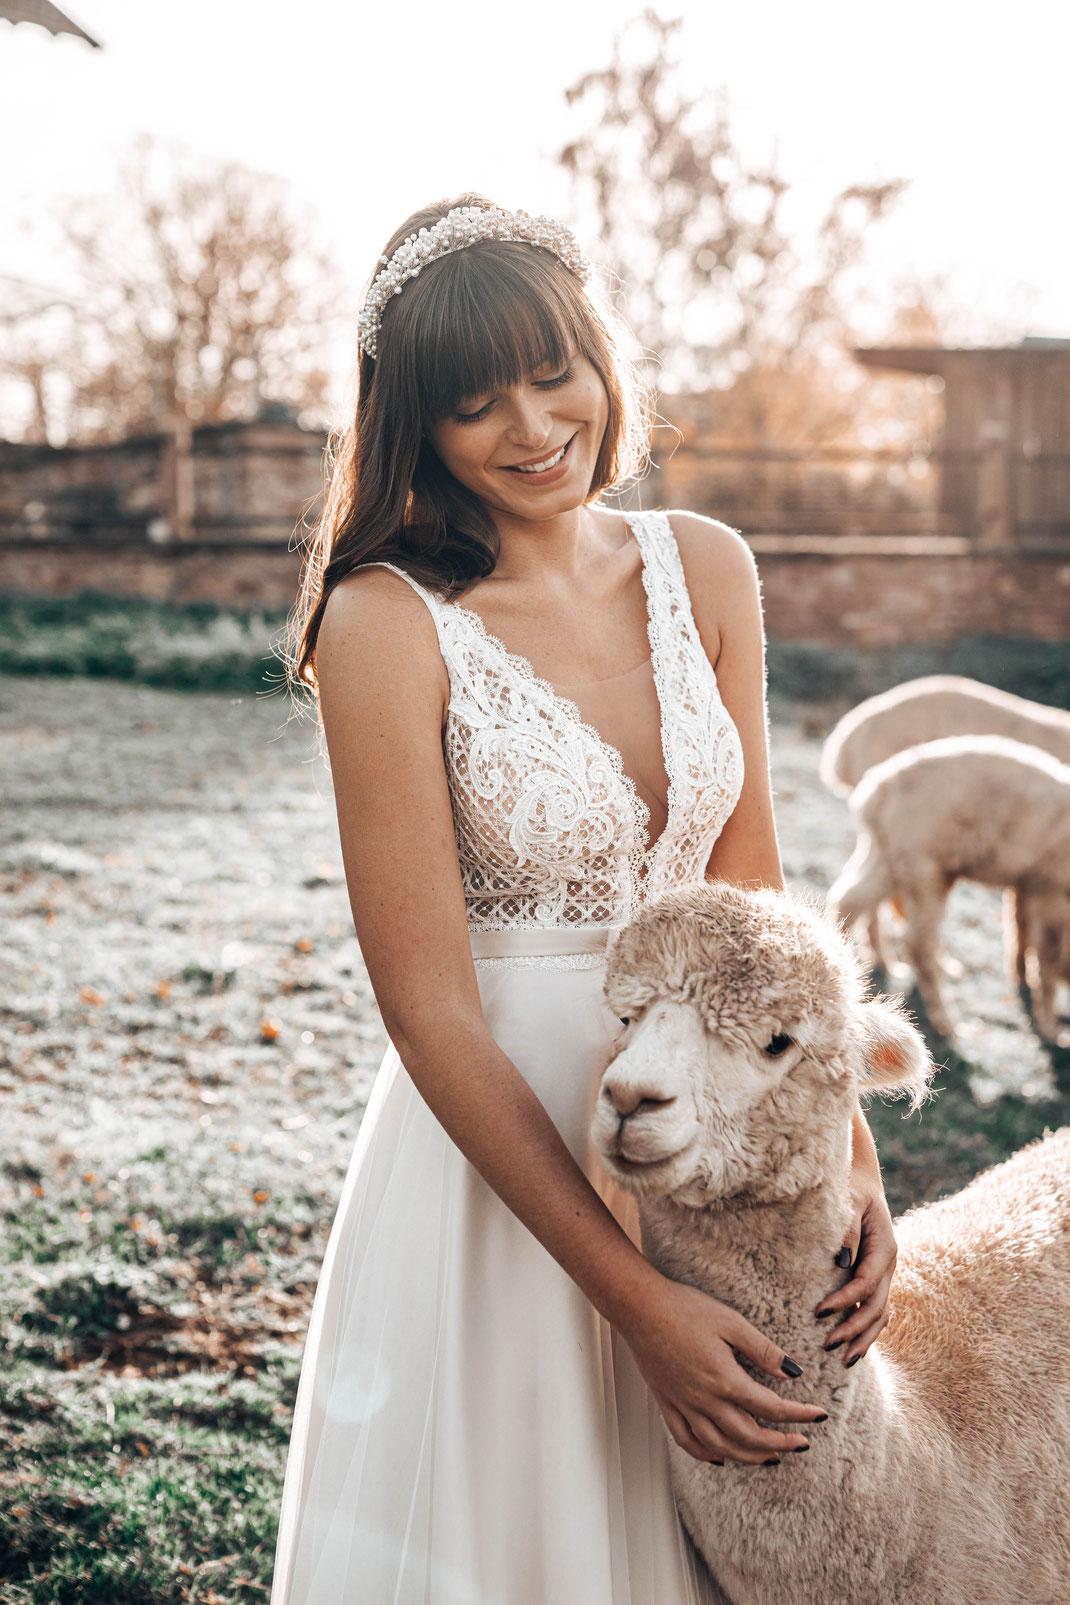 Fotograf Heidelberg Alexa Bachmann Goldstück Fotografie Hochzeitsfotograf